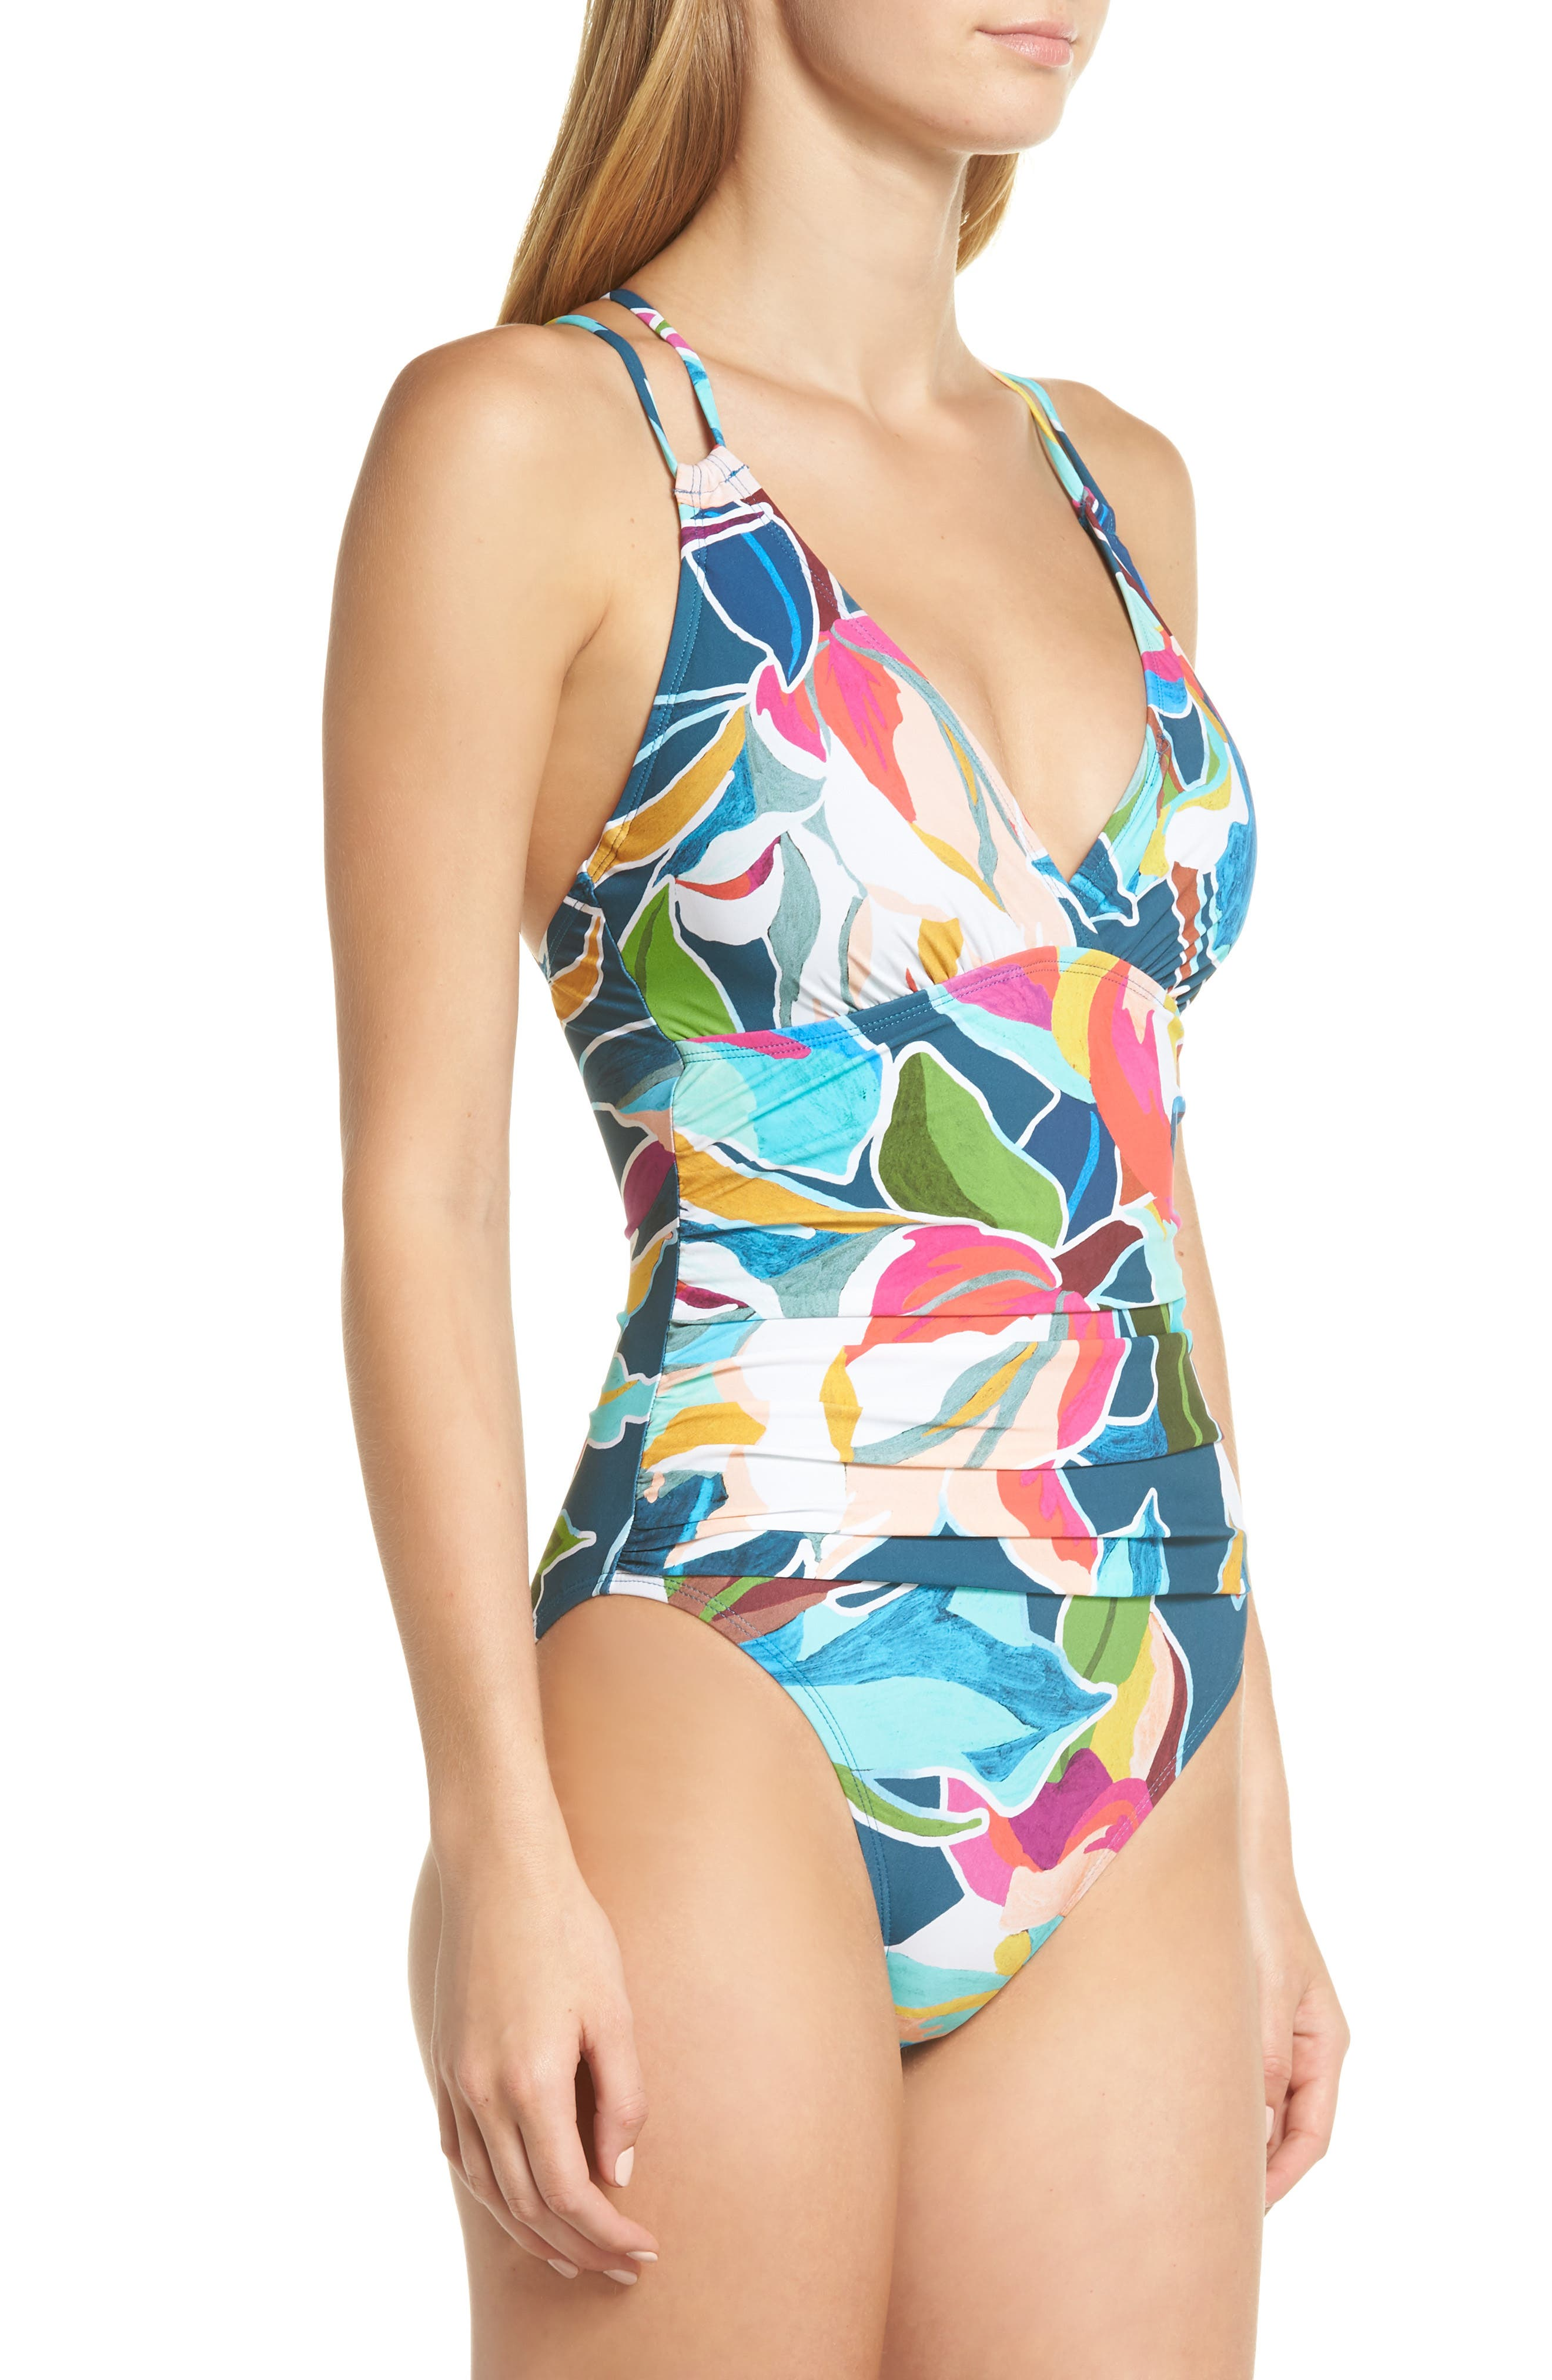 LA BLANCA, Floral Surplice One-Piece Swimsuit, Alternate thumbnail 4, color, MARINA